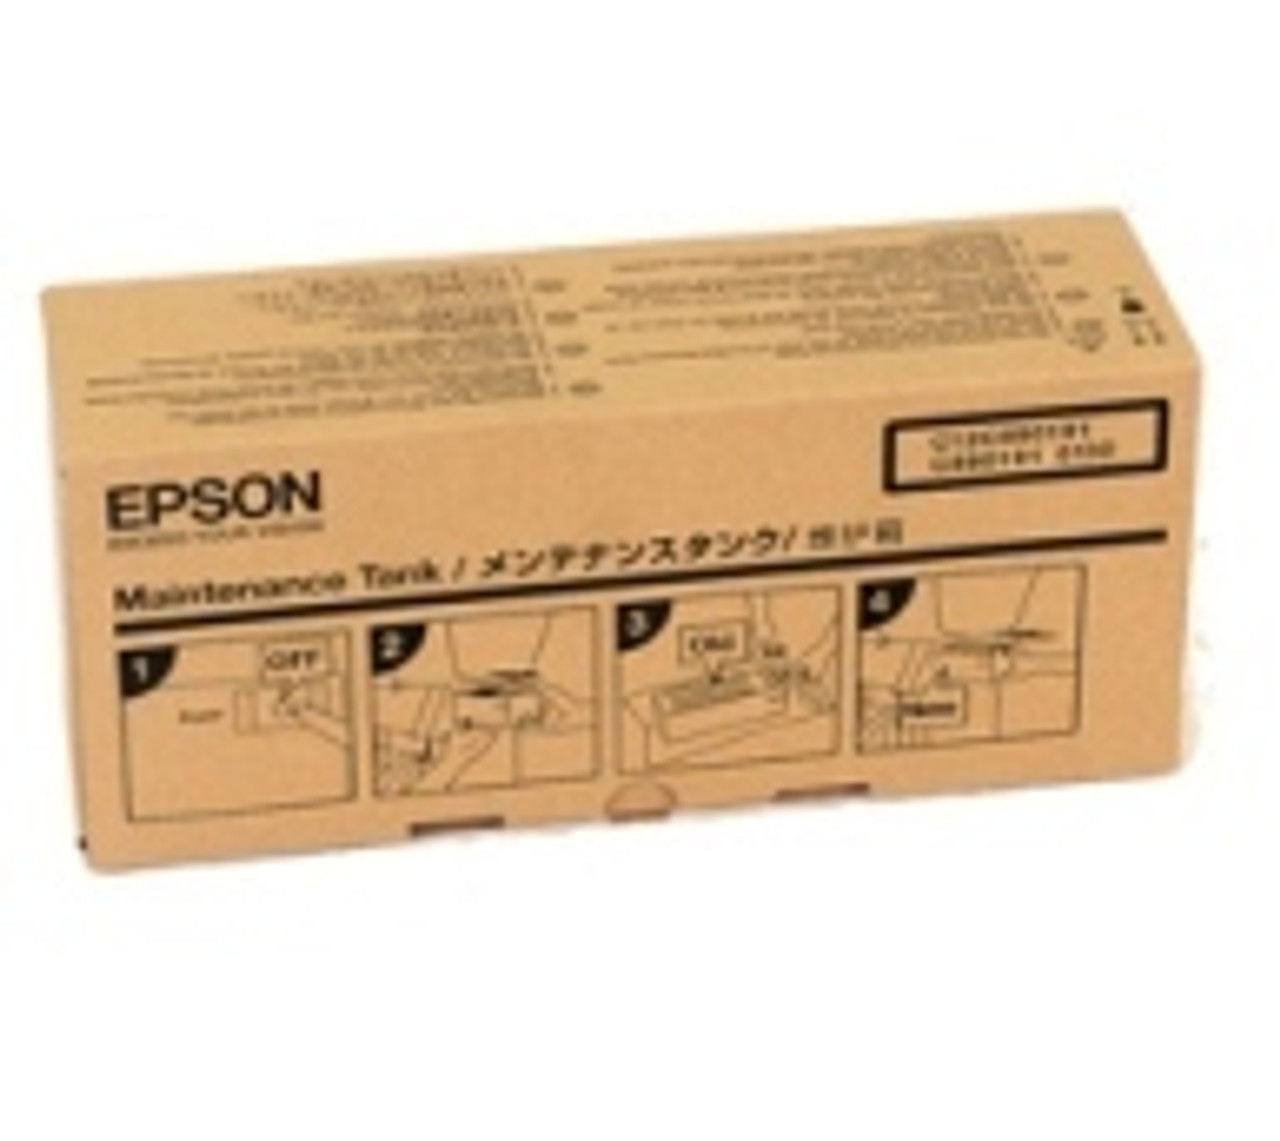 Epson T619000 Maintenance Tank